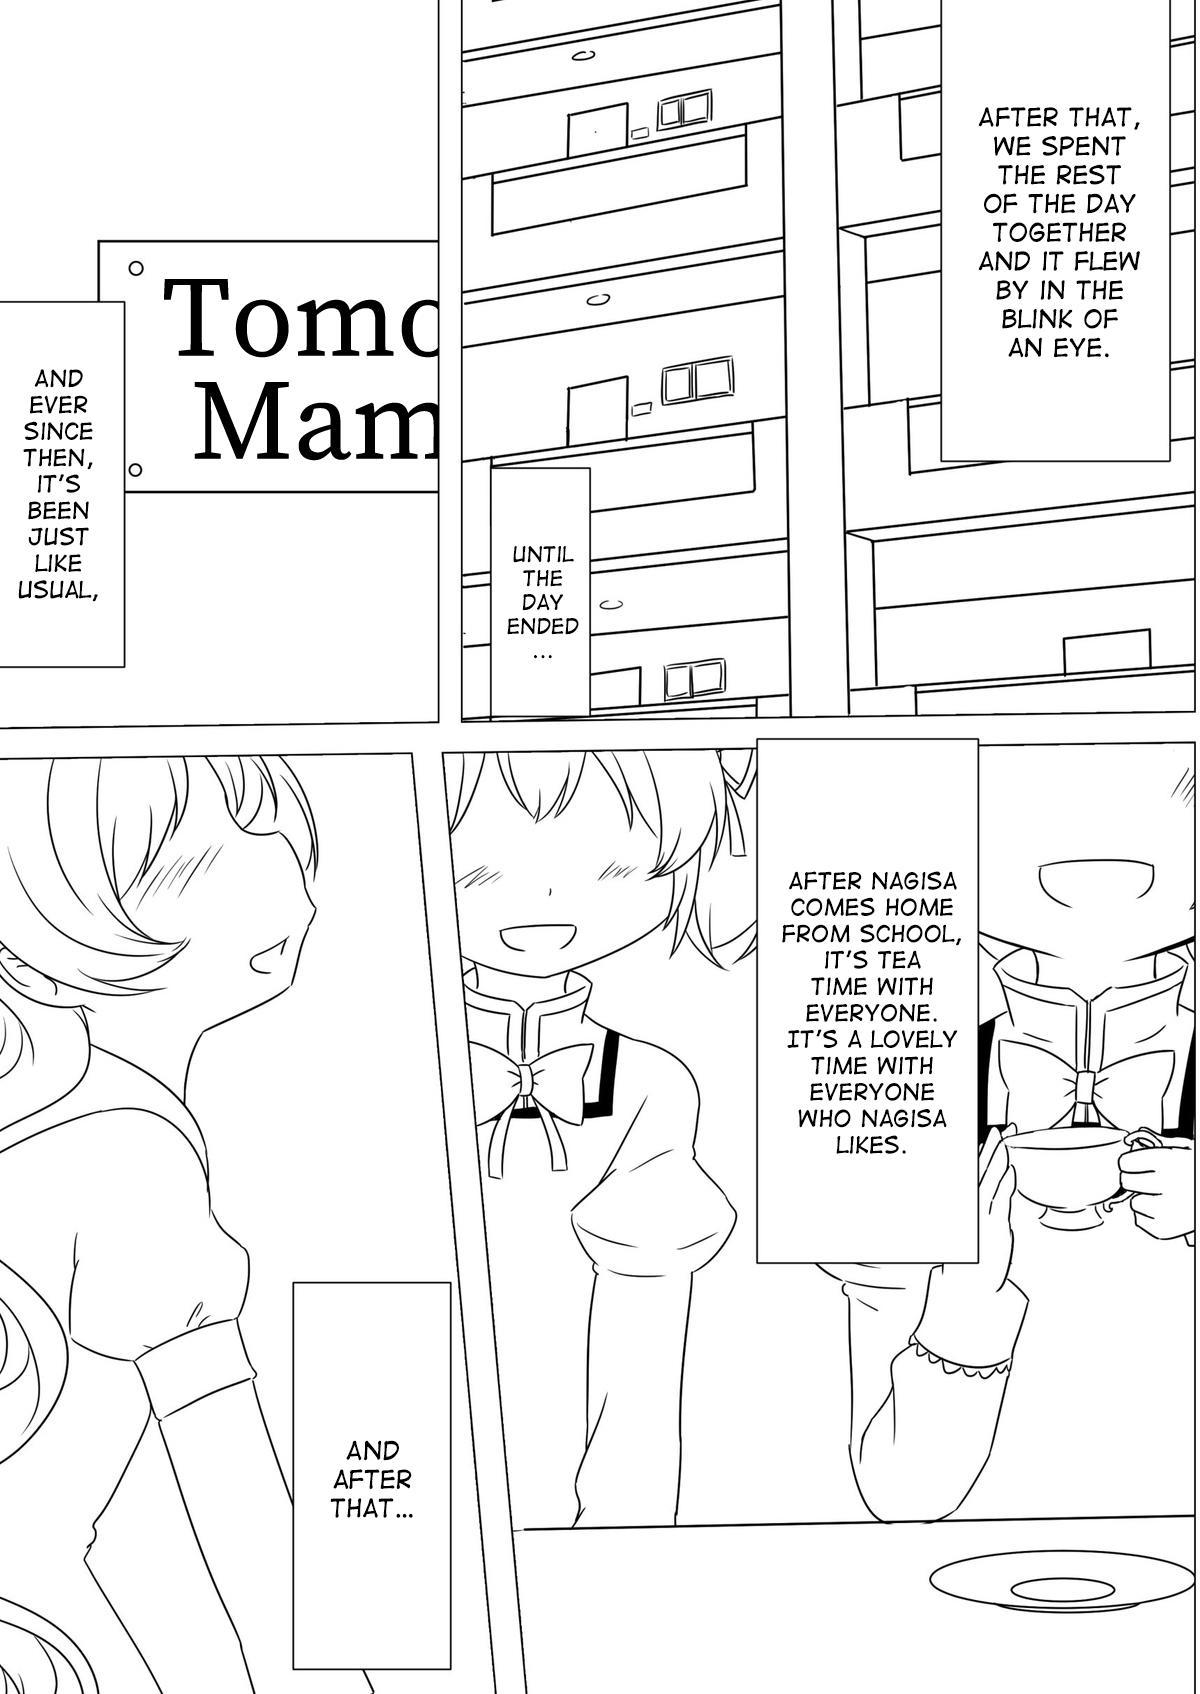 [Tomato Nouen (Abutomato)] Futari no Jikan + Futari no Jikan -Zoku- | Our time together + Our time together - continuation - (Puella Magi Madoka Magica) [English] [Tabunne Scans] [Digital] 38